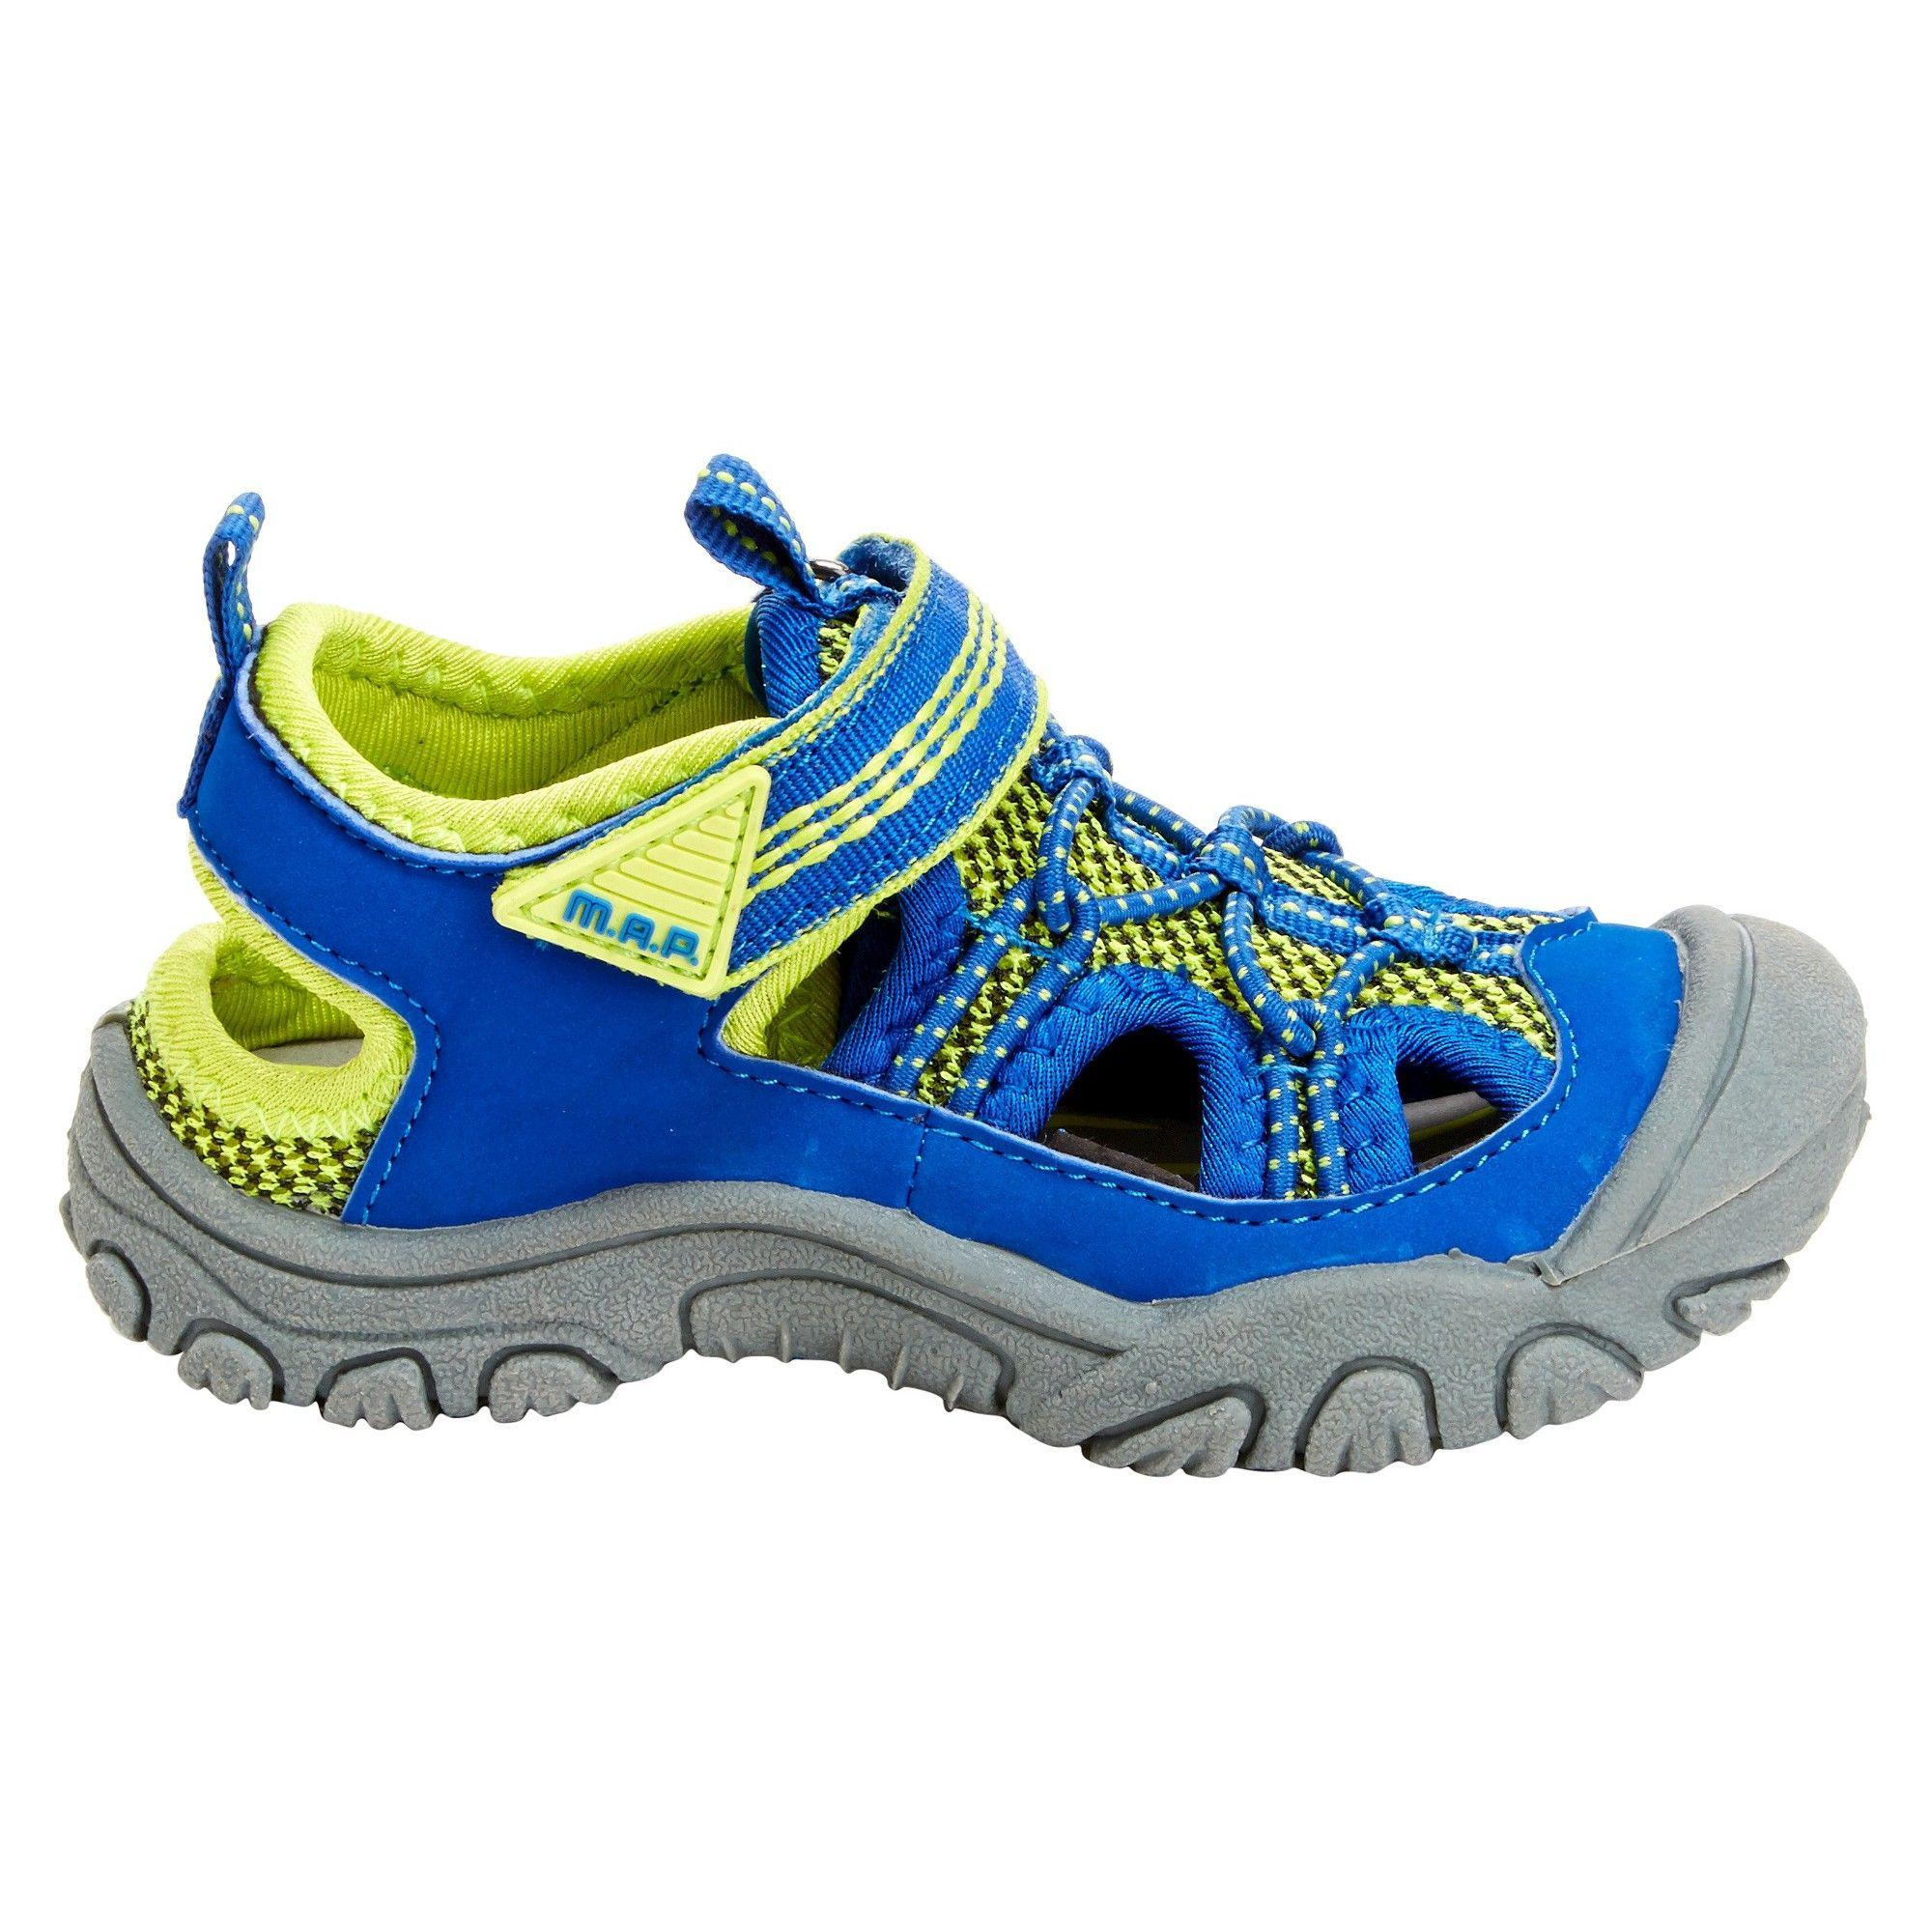 M A P Toddler Boys Emmon Fisherman Sandals Blue Neon 10